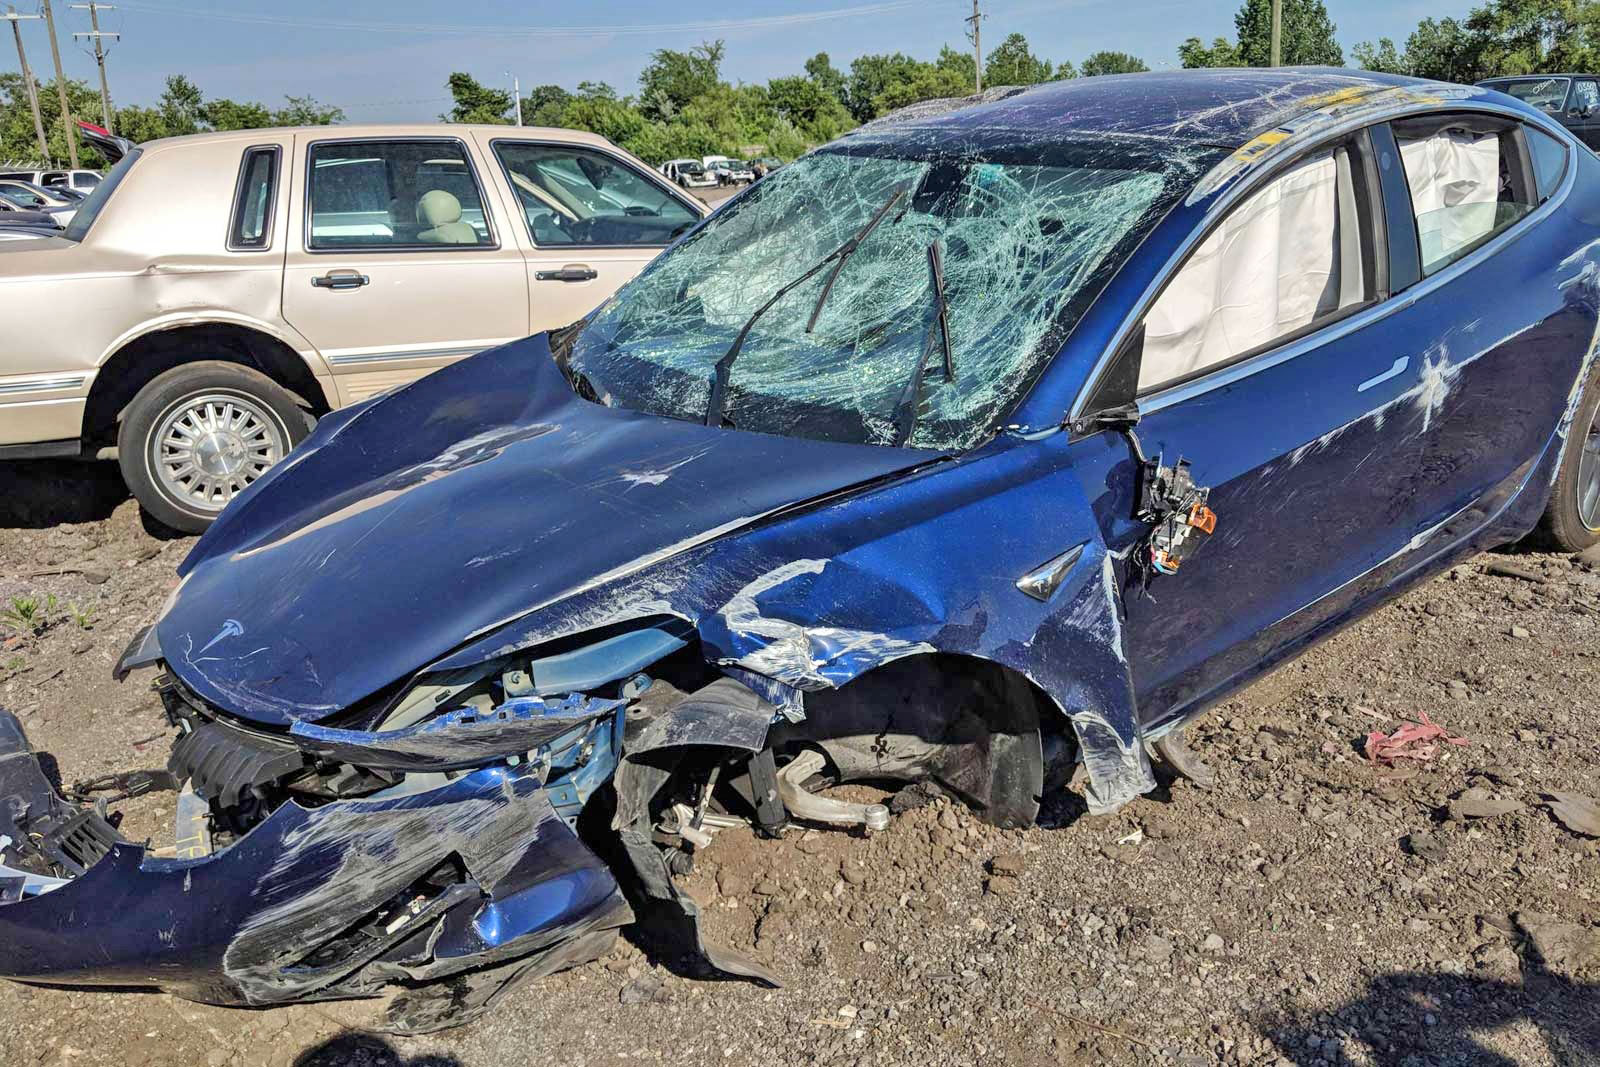 Tesla Model 3 rollover crash shows its real-world safety